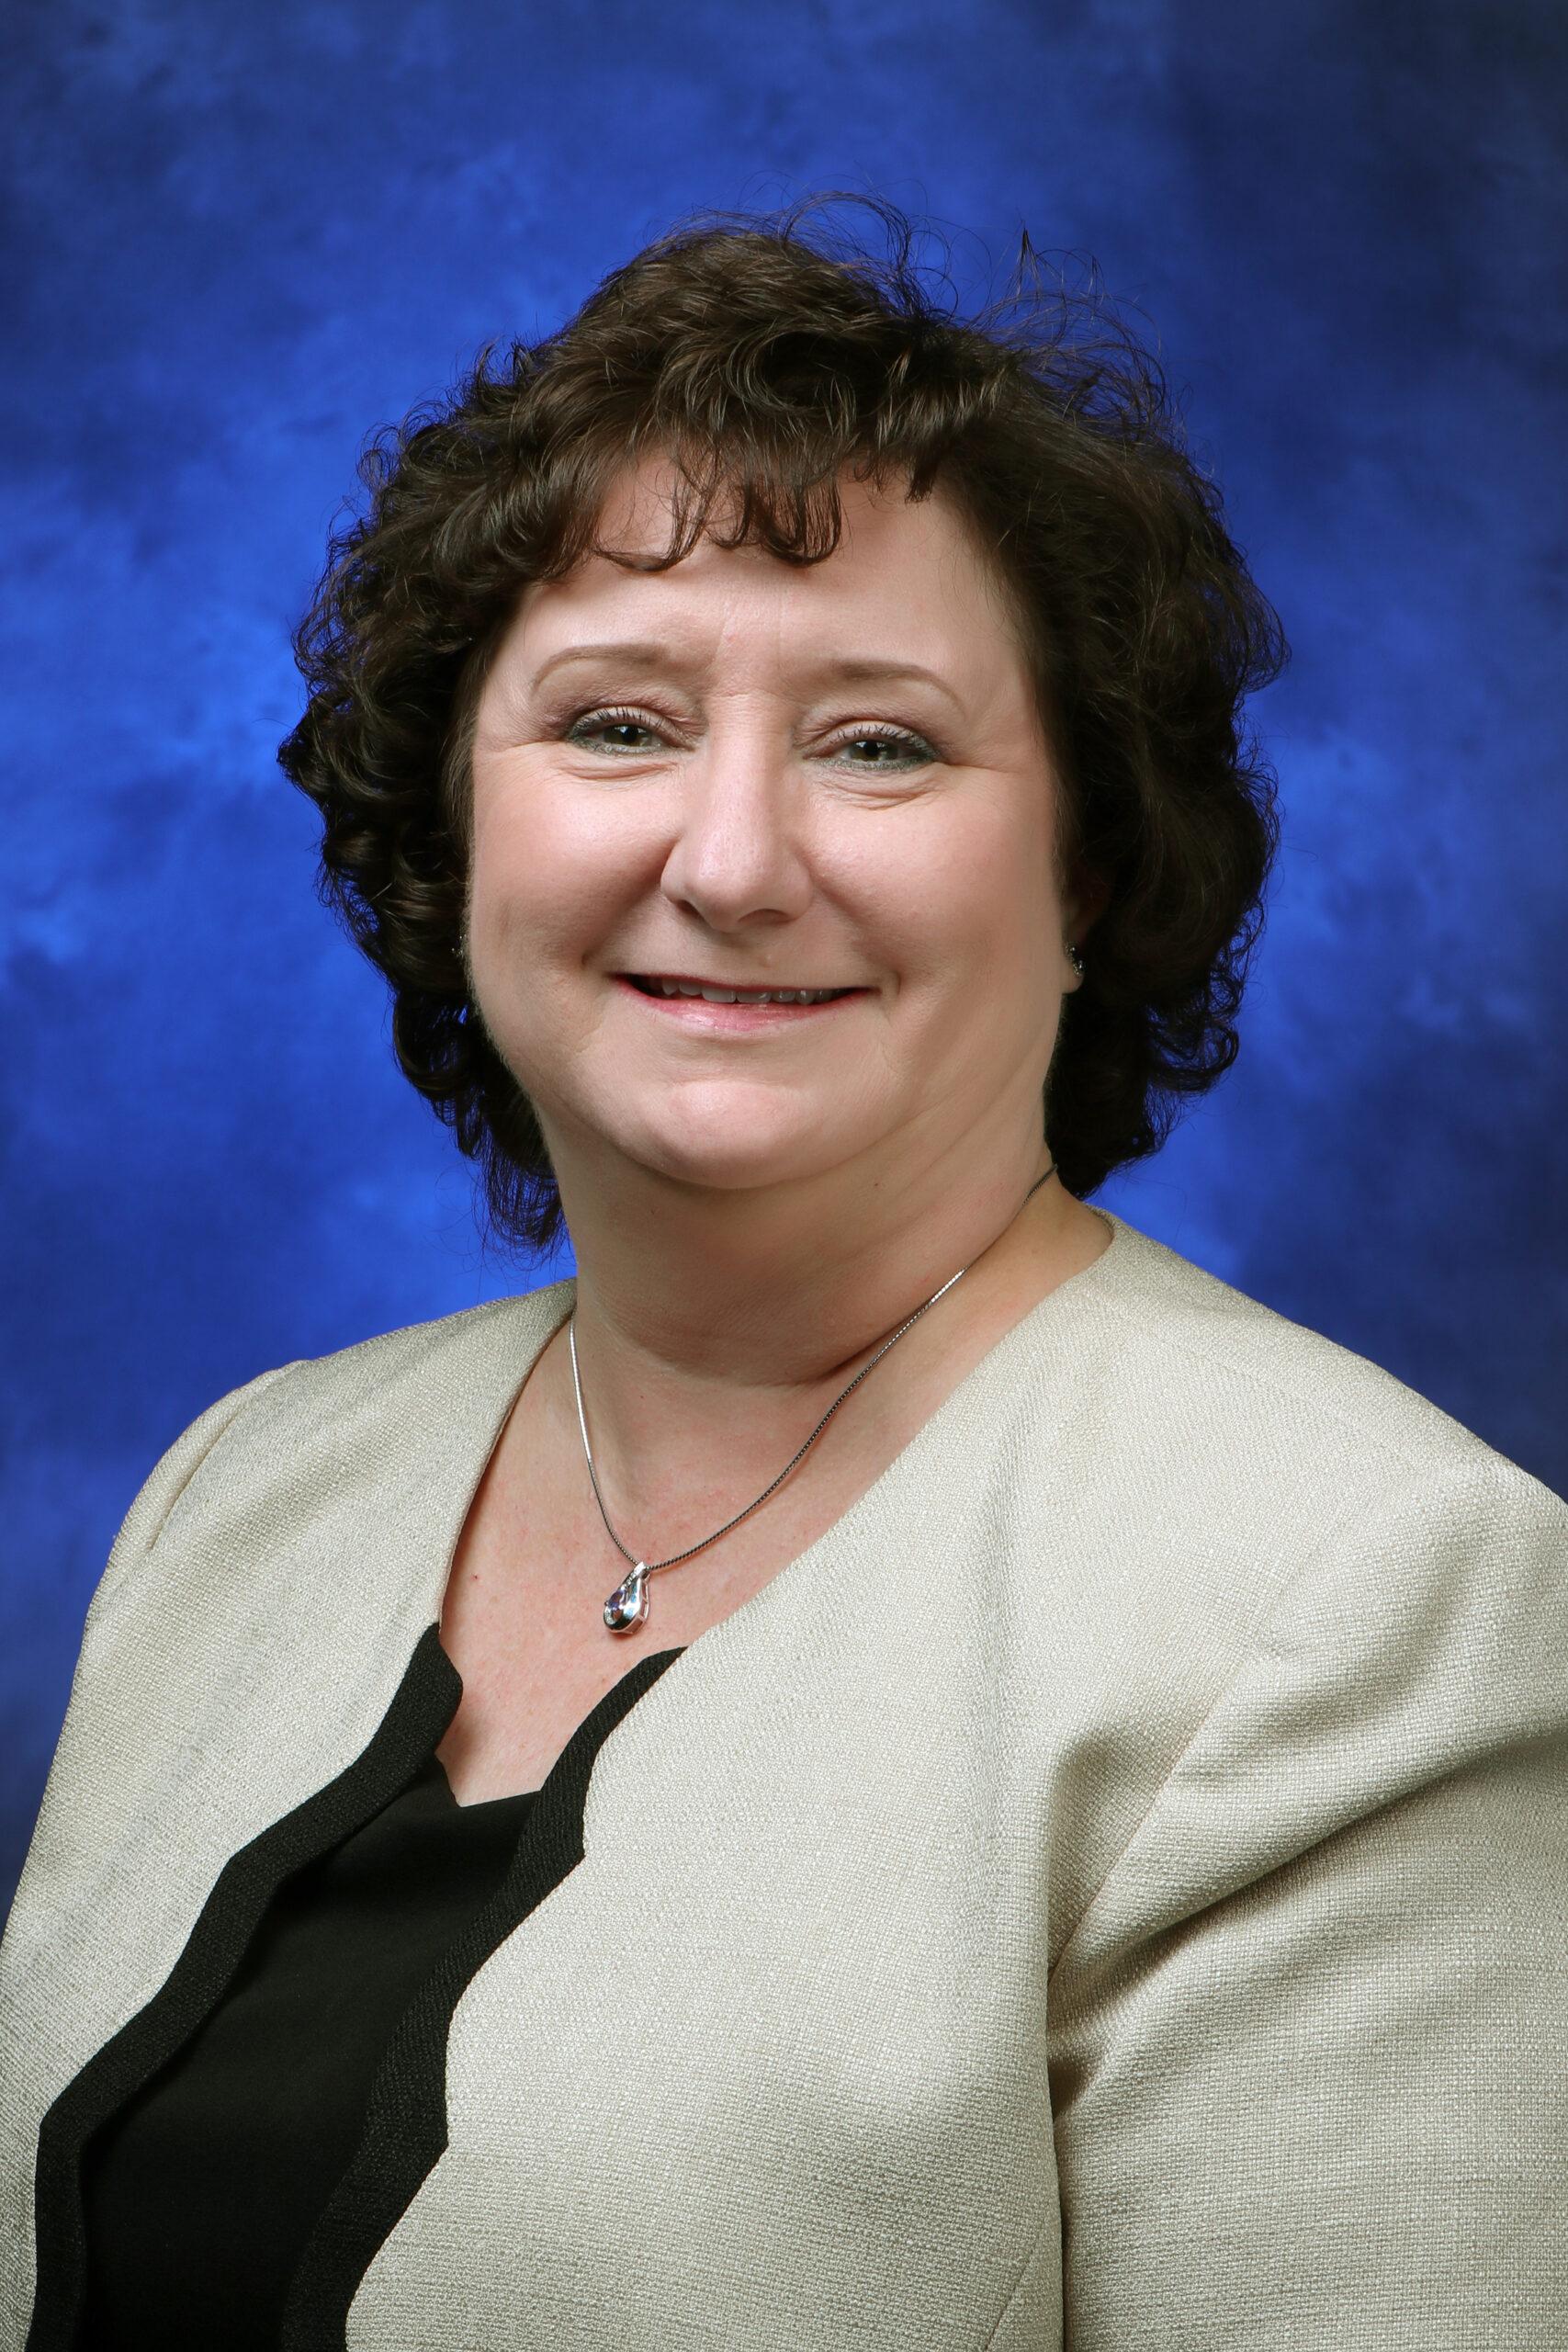 Gina Smock, MBA, BSN, RN, NEA-BC